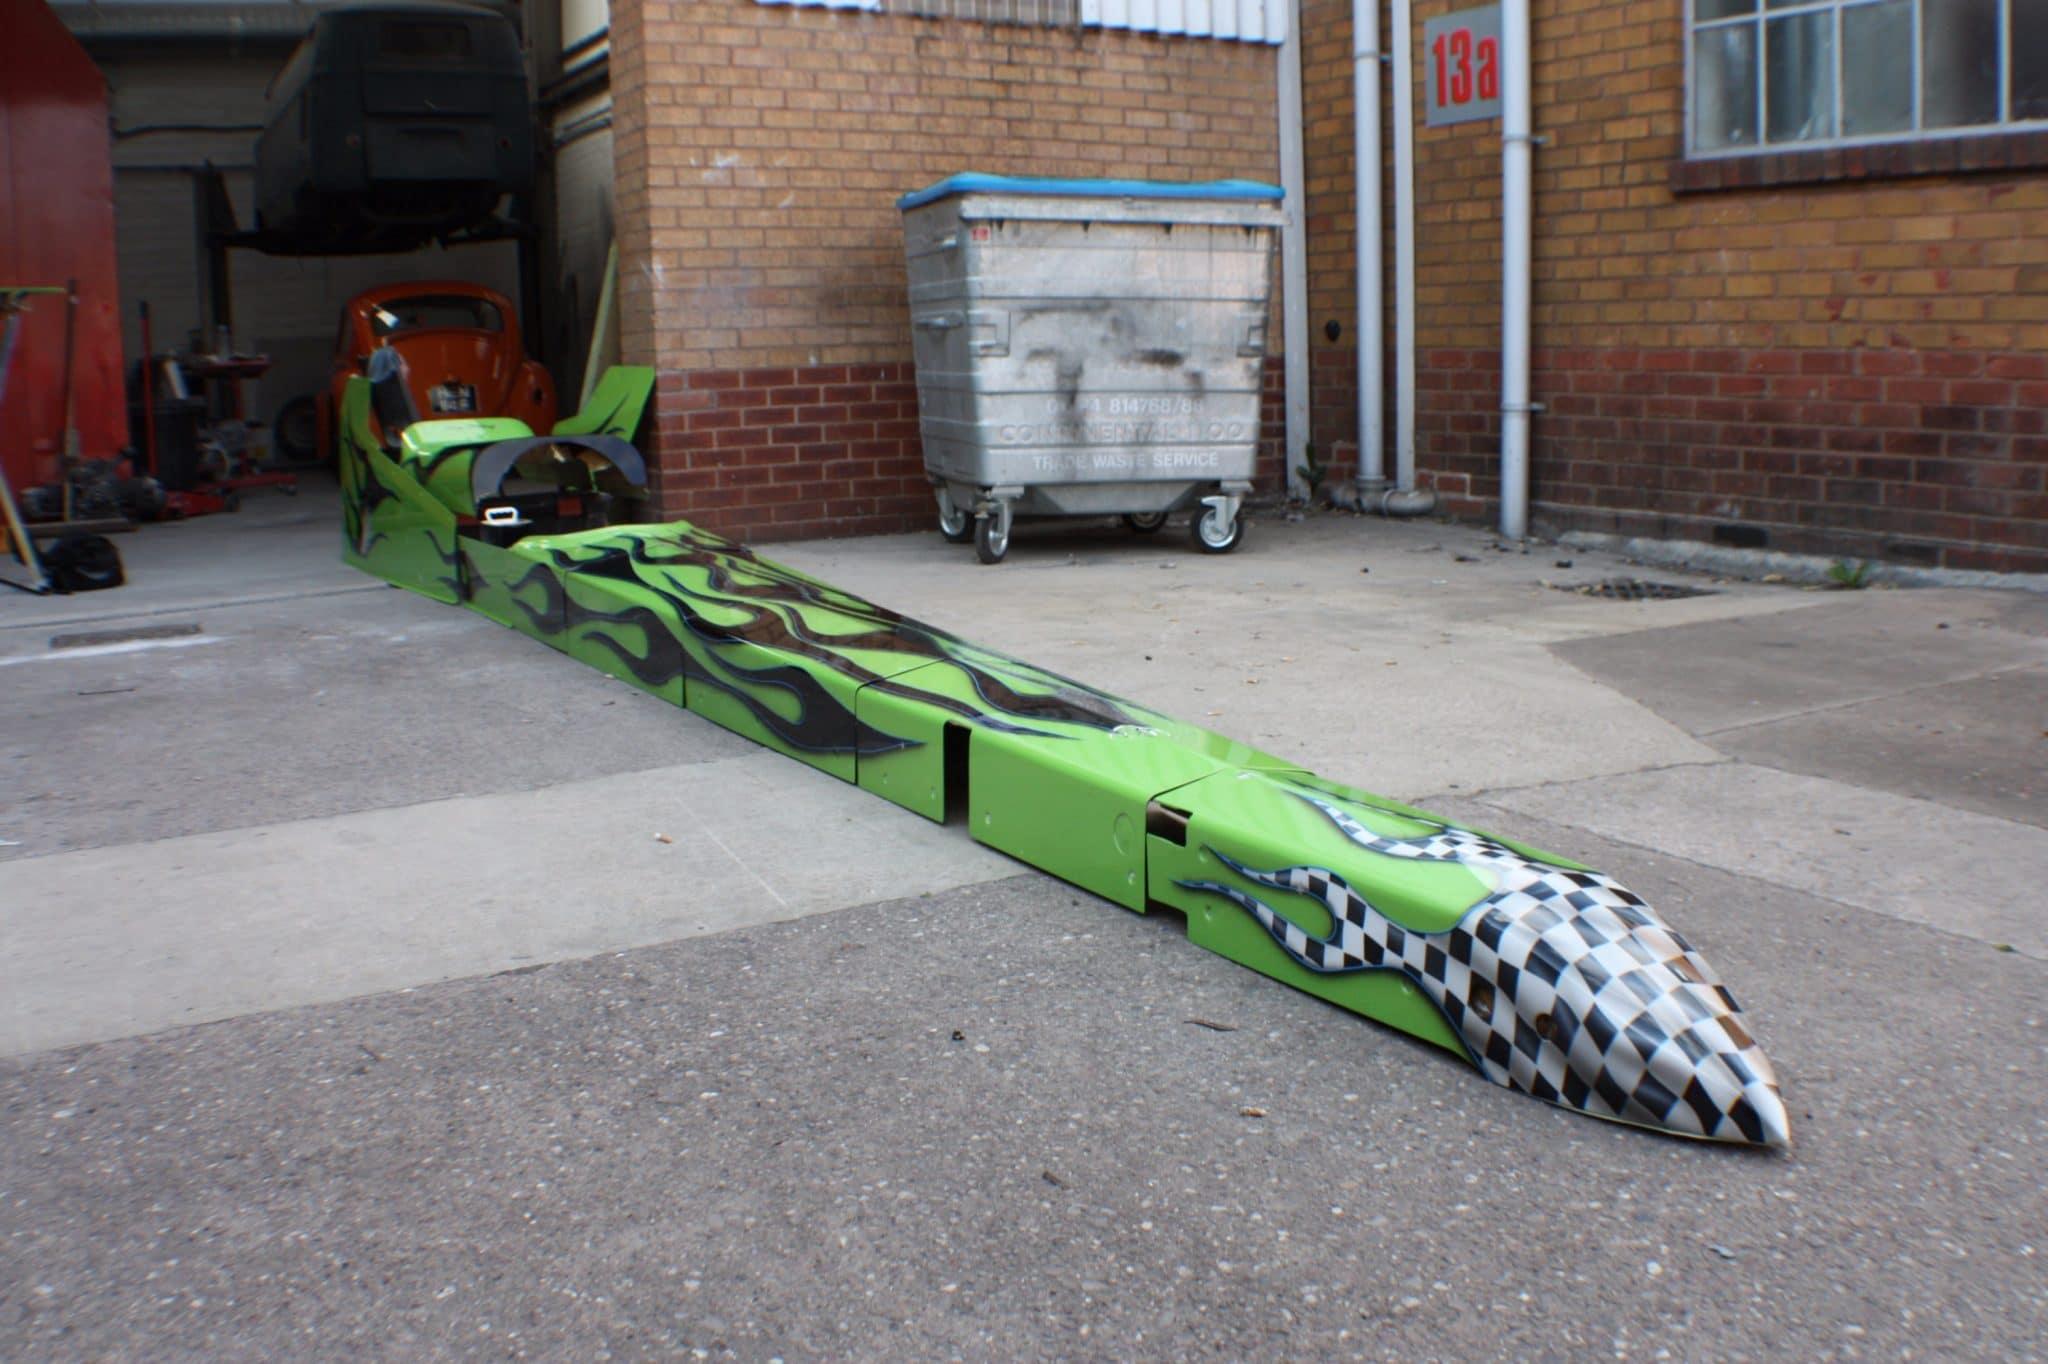 dragster on garage floor - in progress